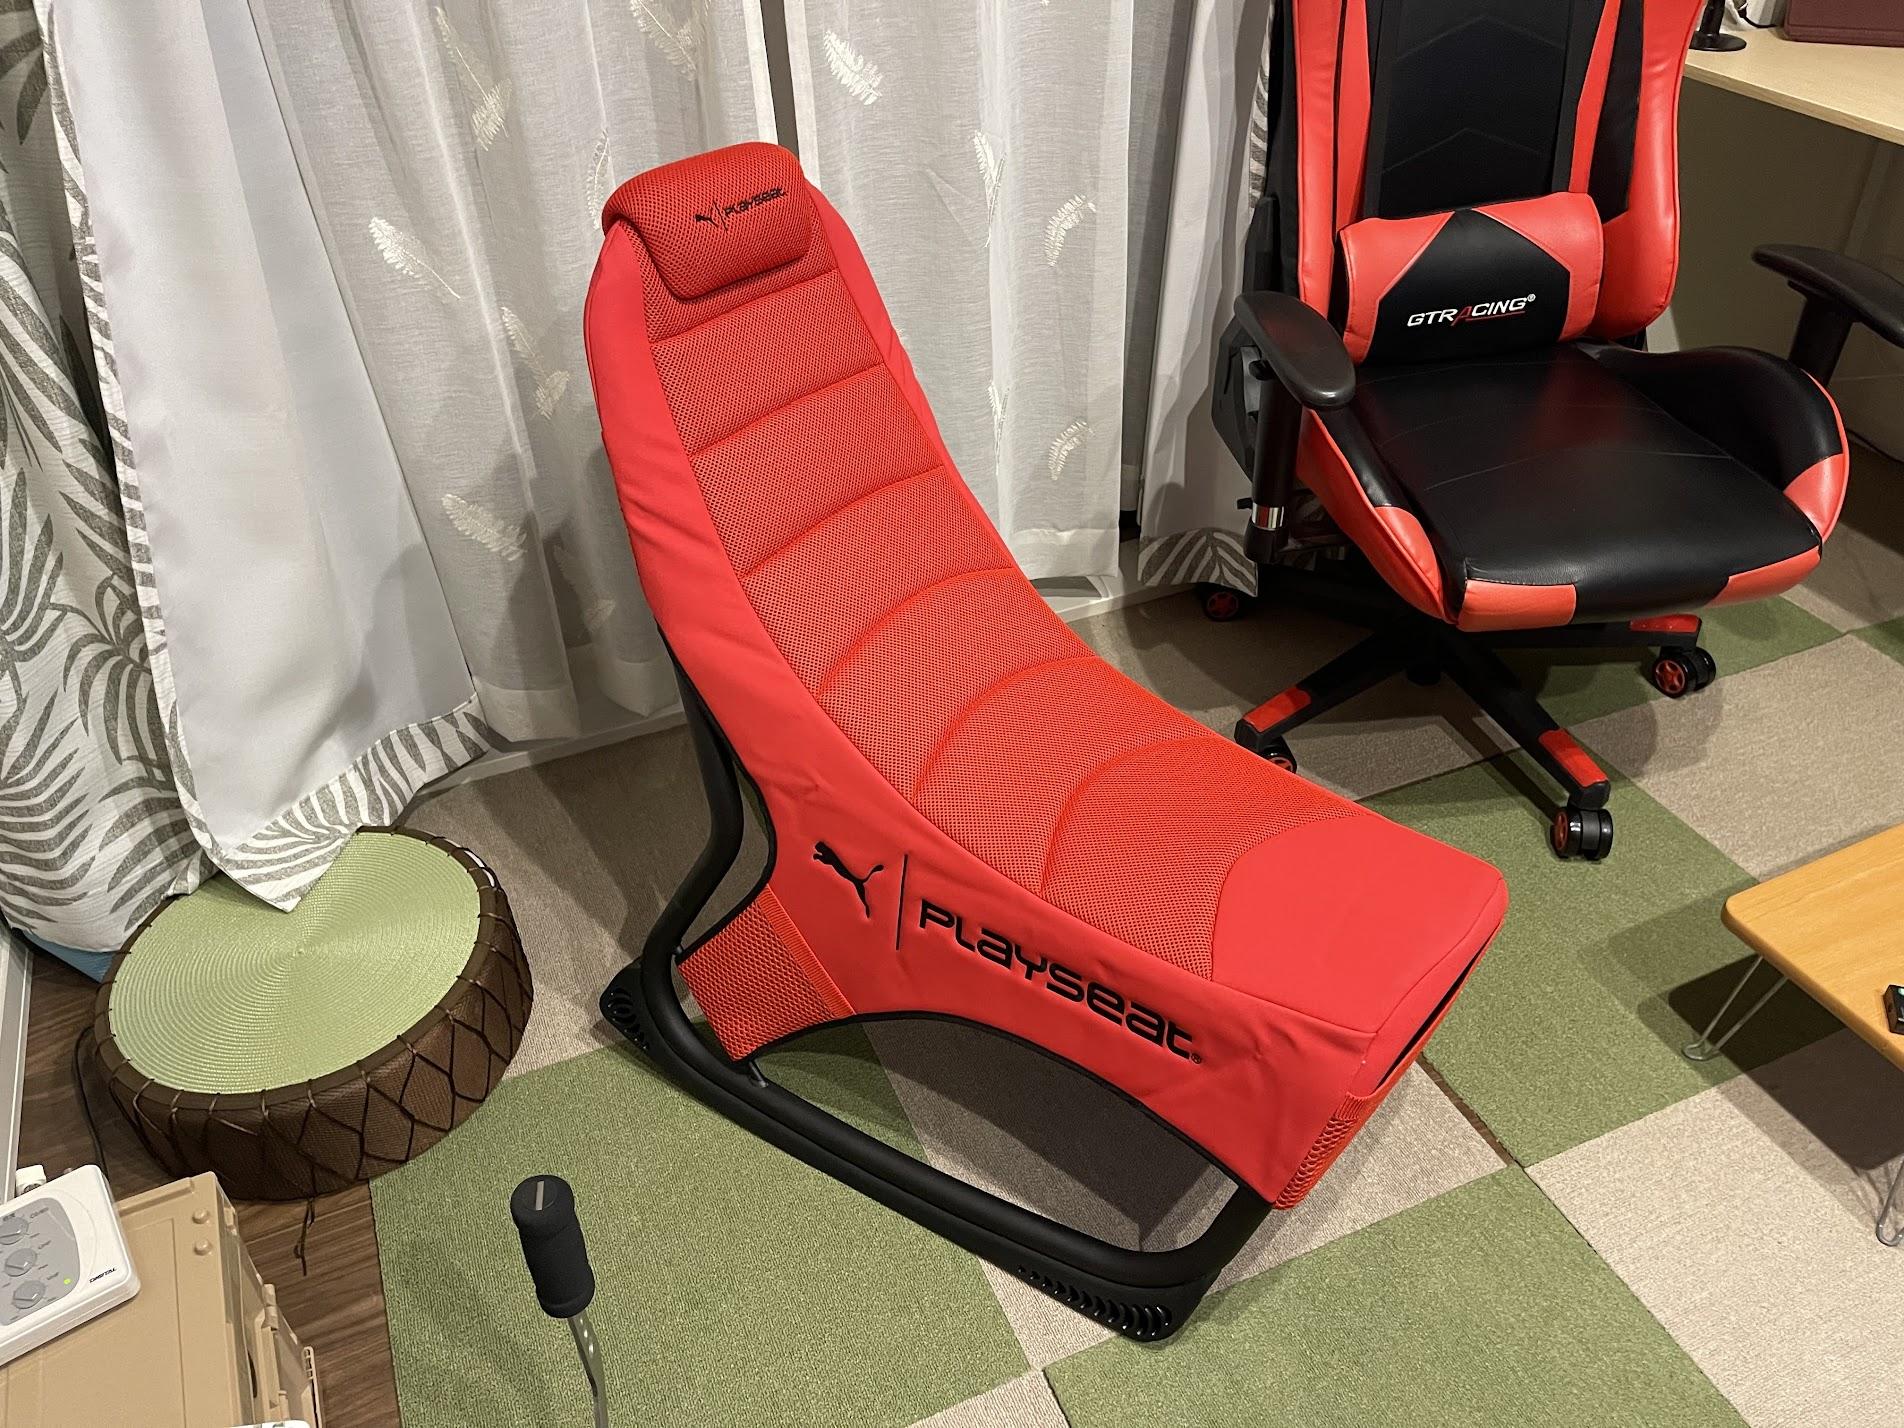 PlaySeet Puma Active Gaming Seat Redを買ってみた